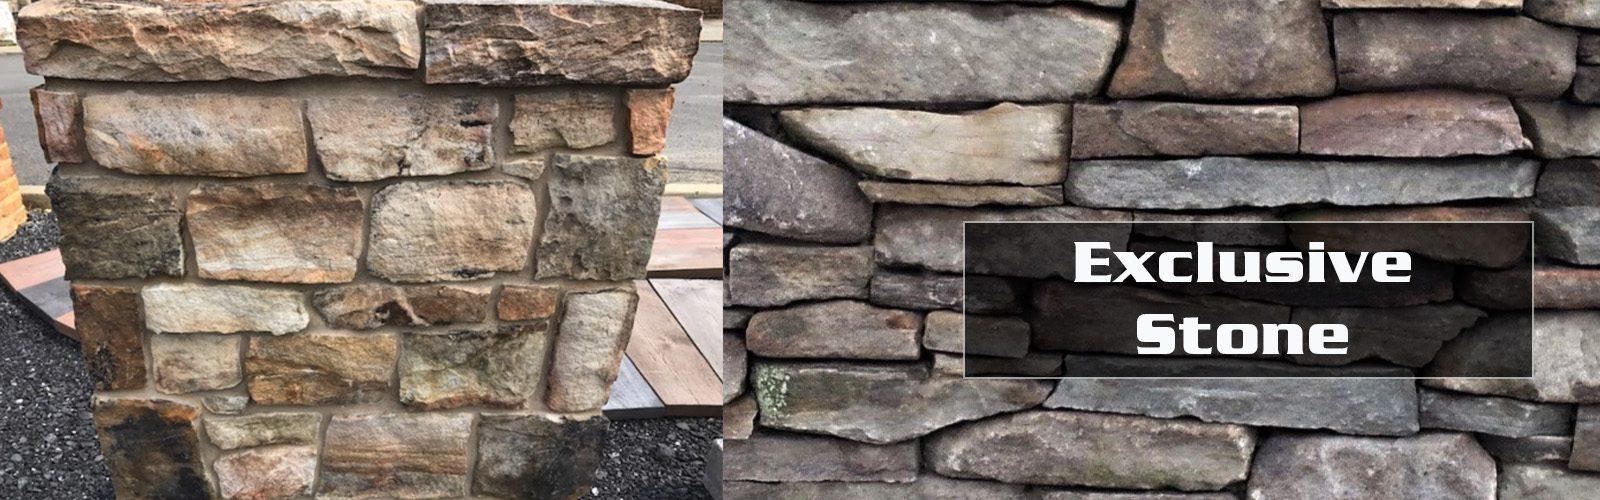 Exclusive-Stone-Veneer-Stone-Dealer-NJ